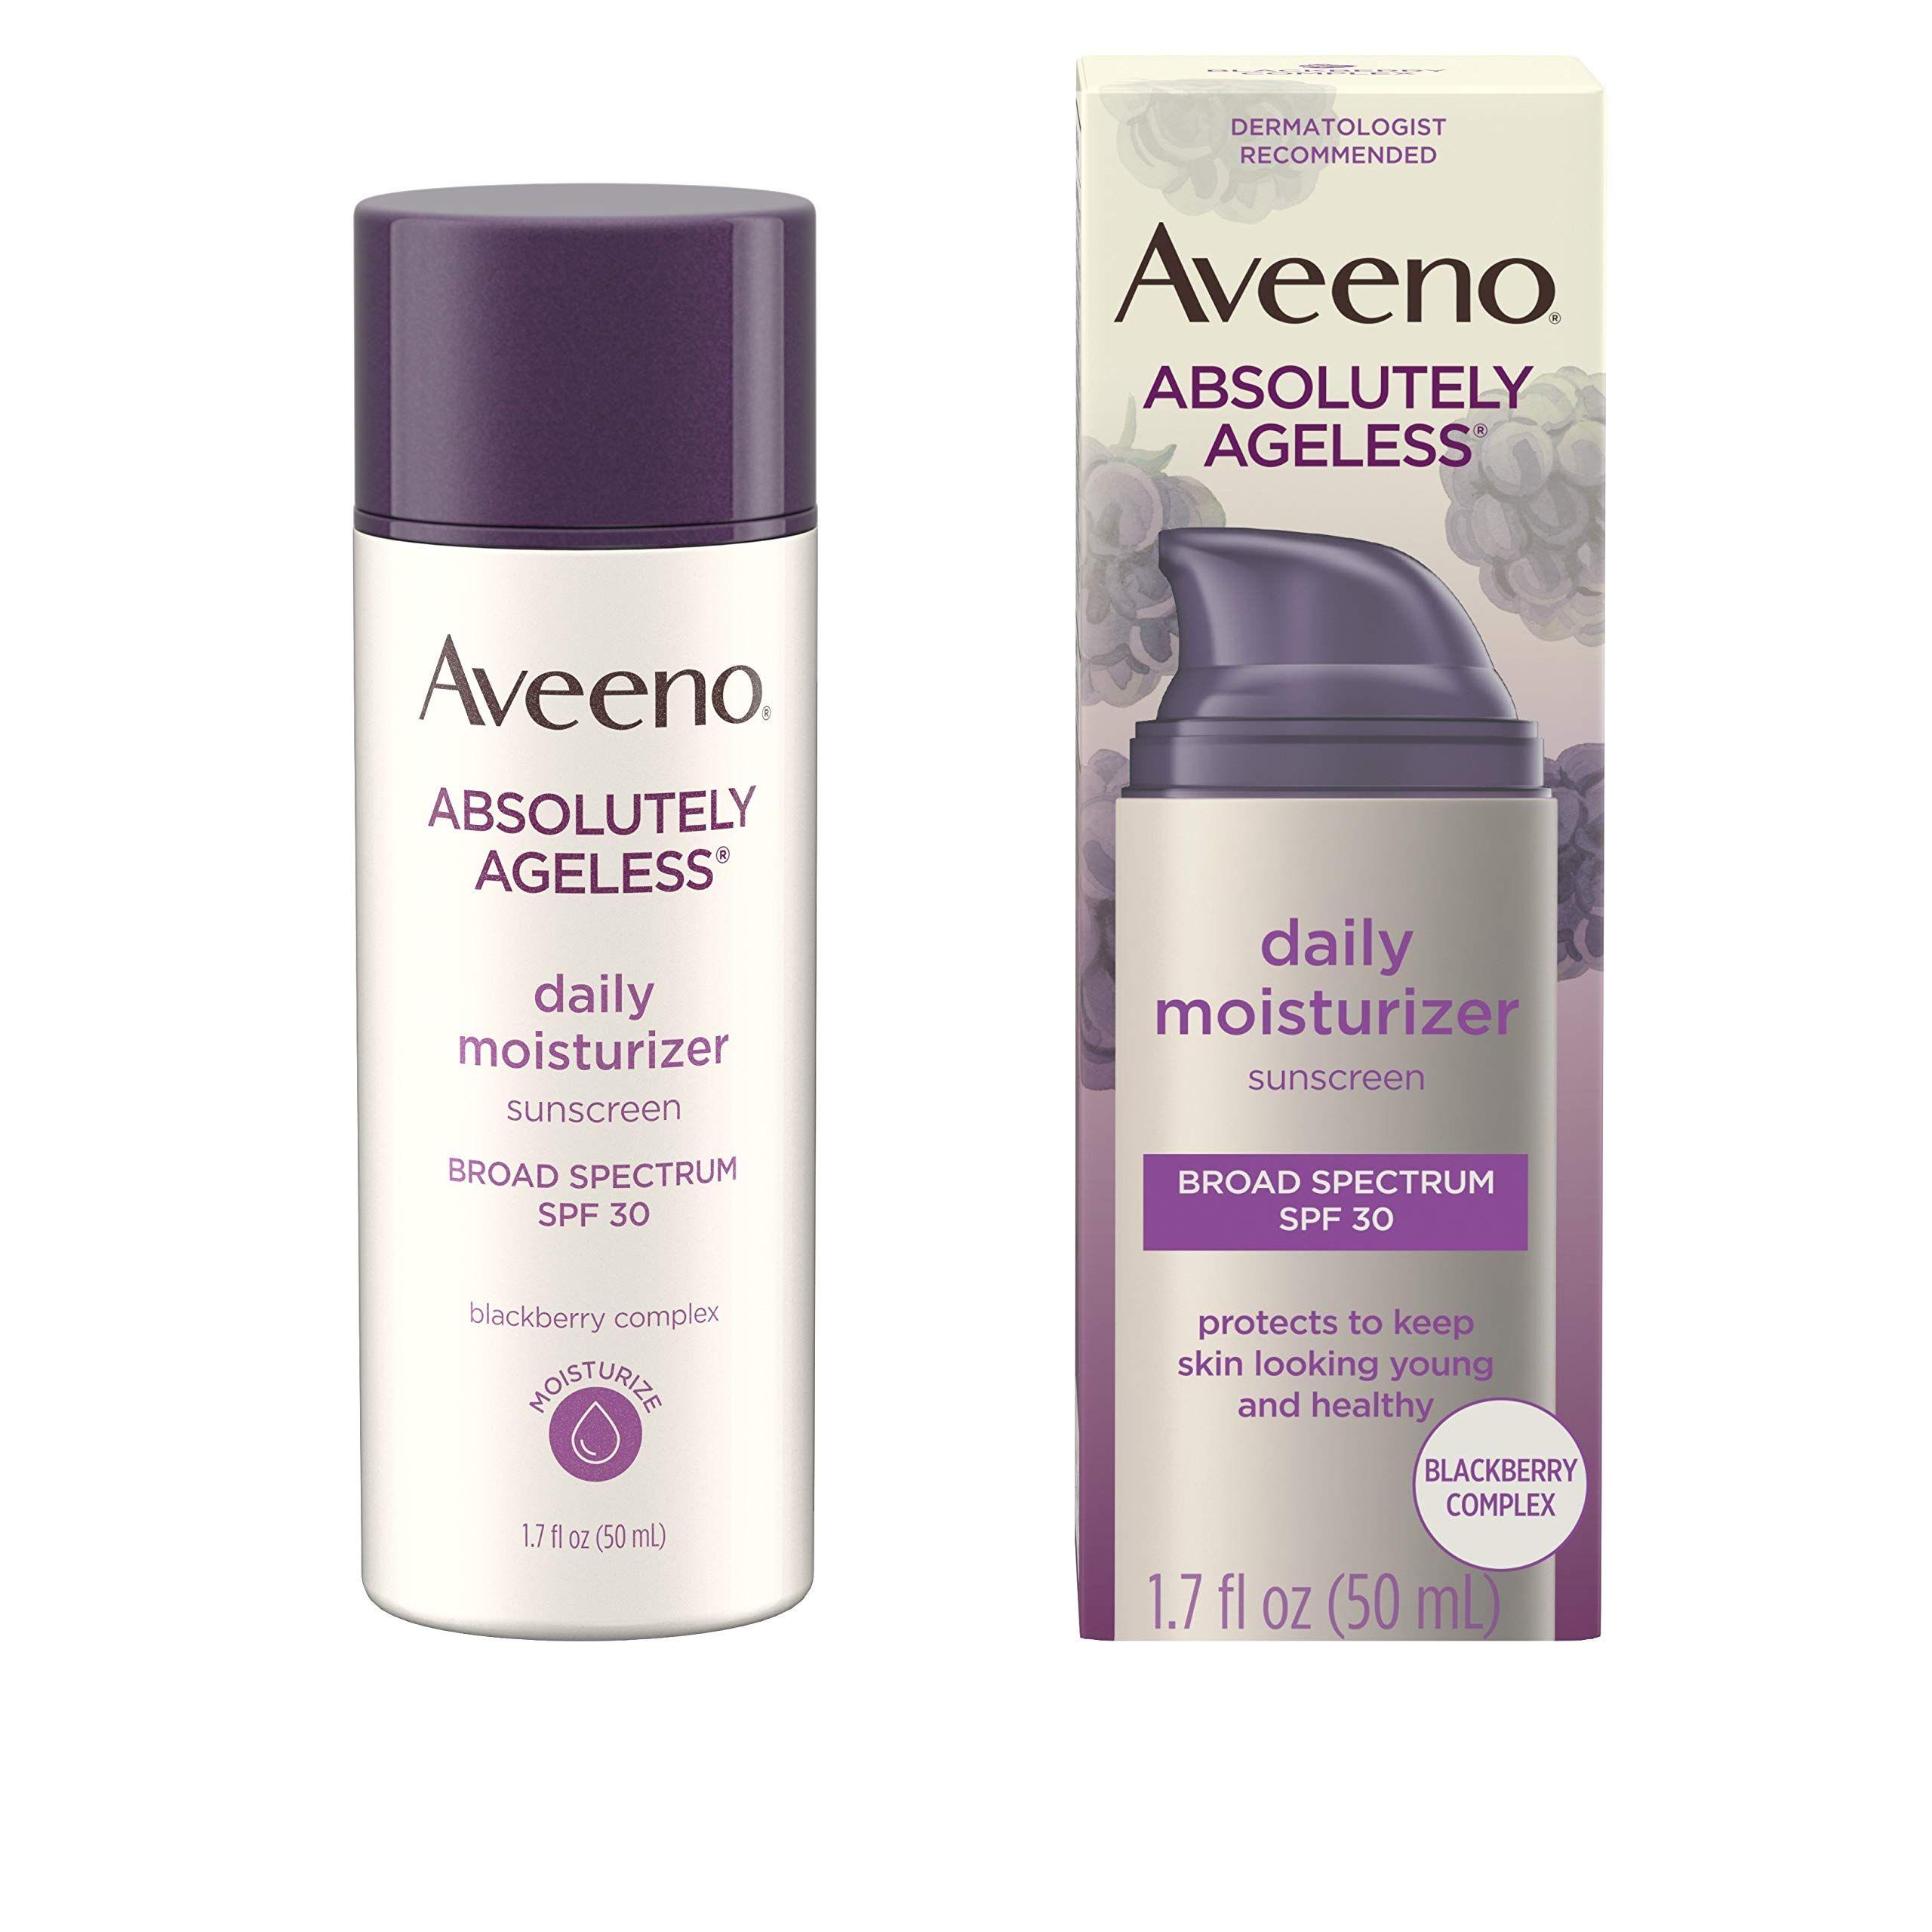 Aveeno moisturizer antioxidant rich hypoallergenic non